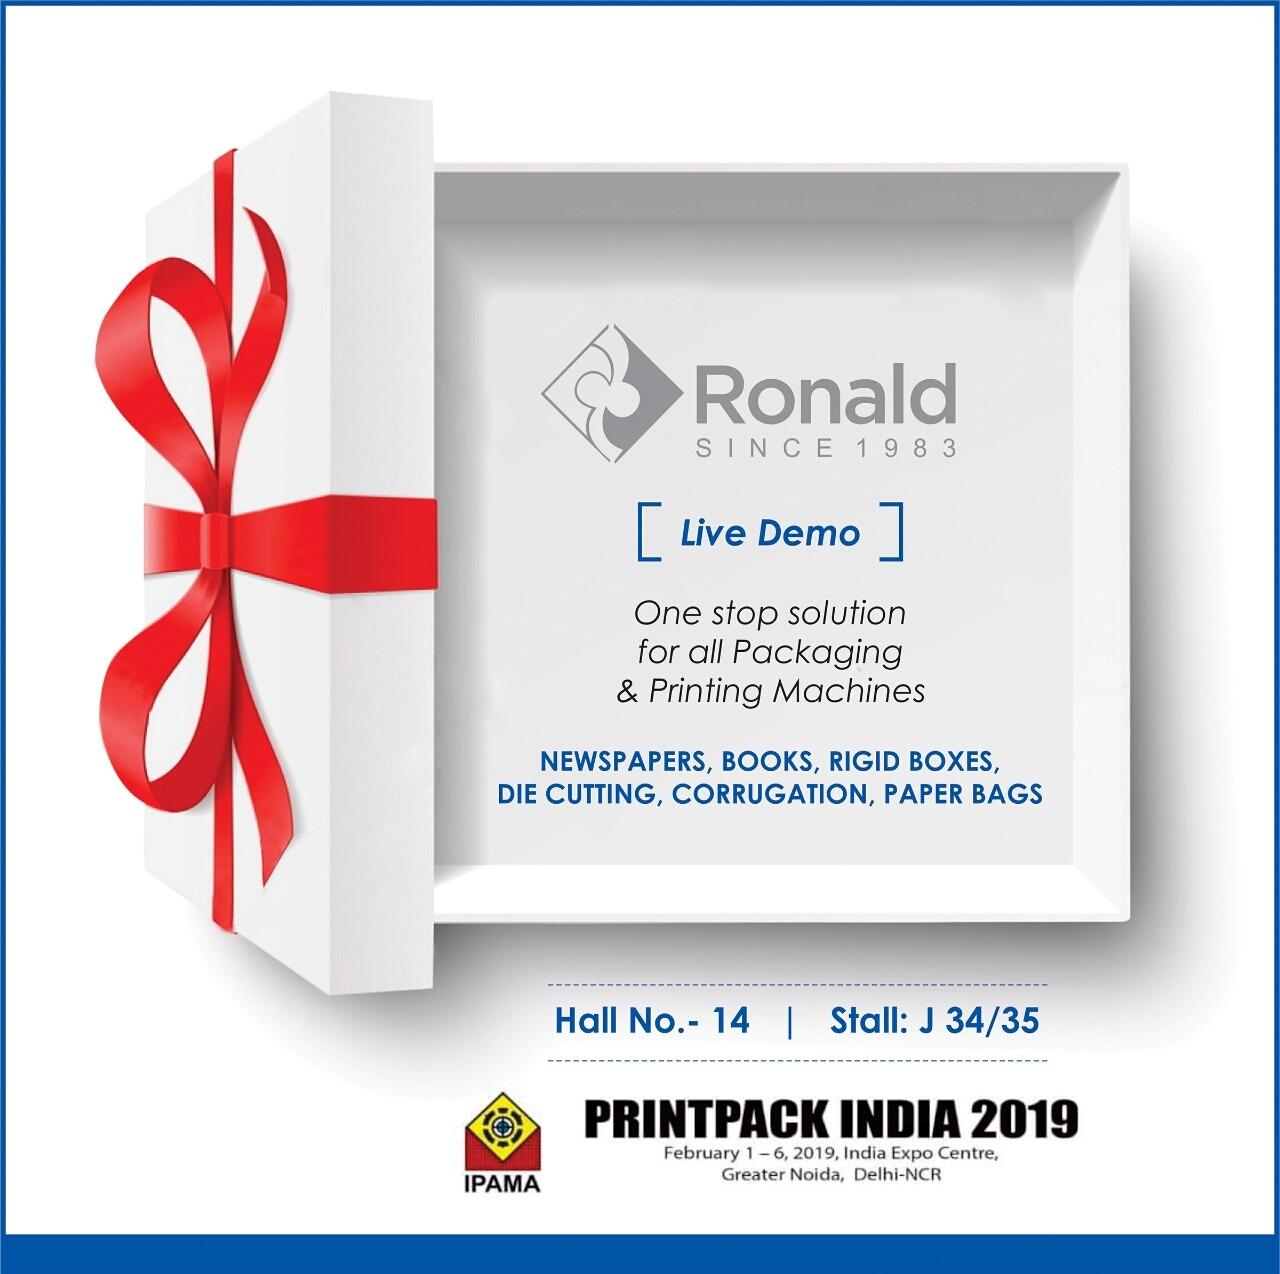 PRINTPACK INDIA 2019 NOTICE_Tangshan Laizhang Import & Export Co , Ltd